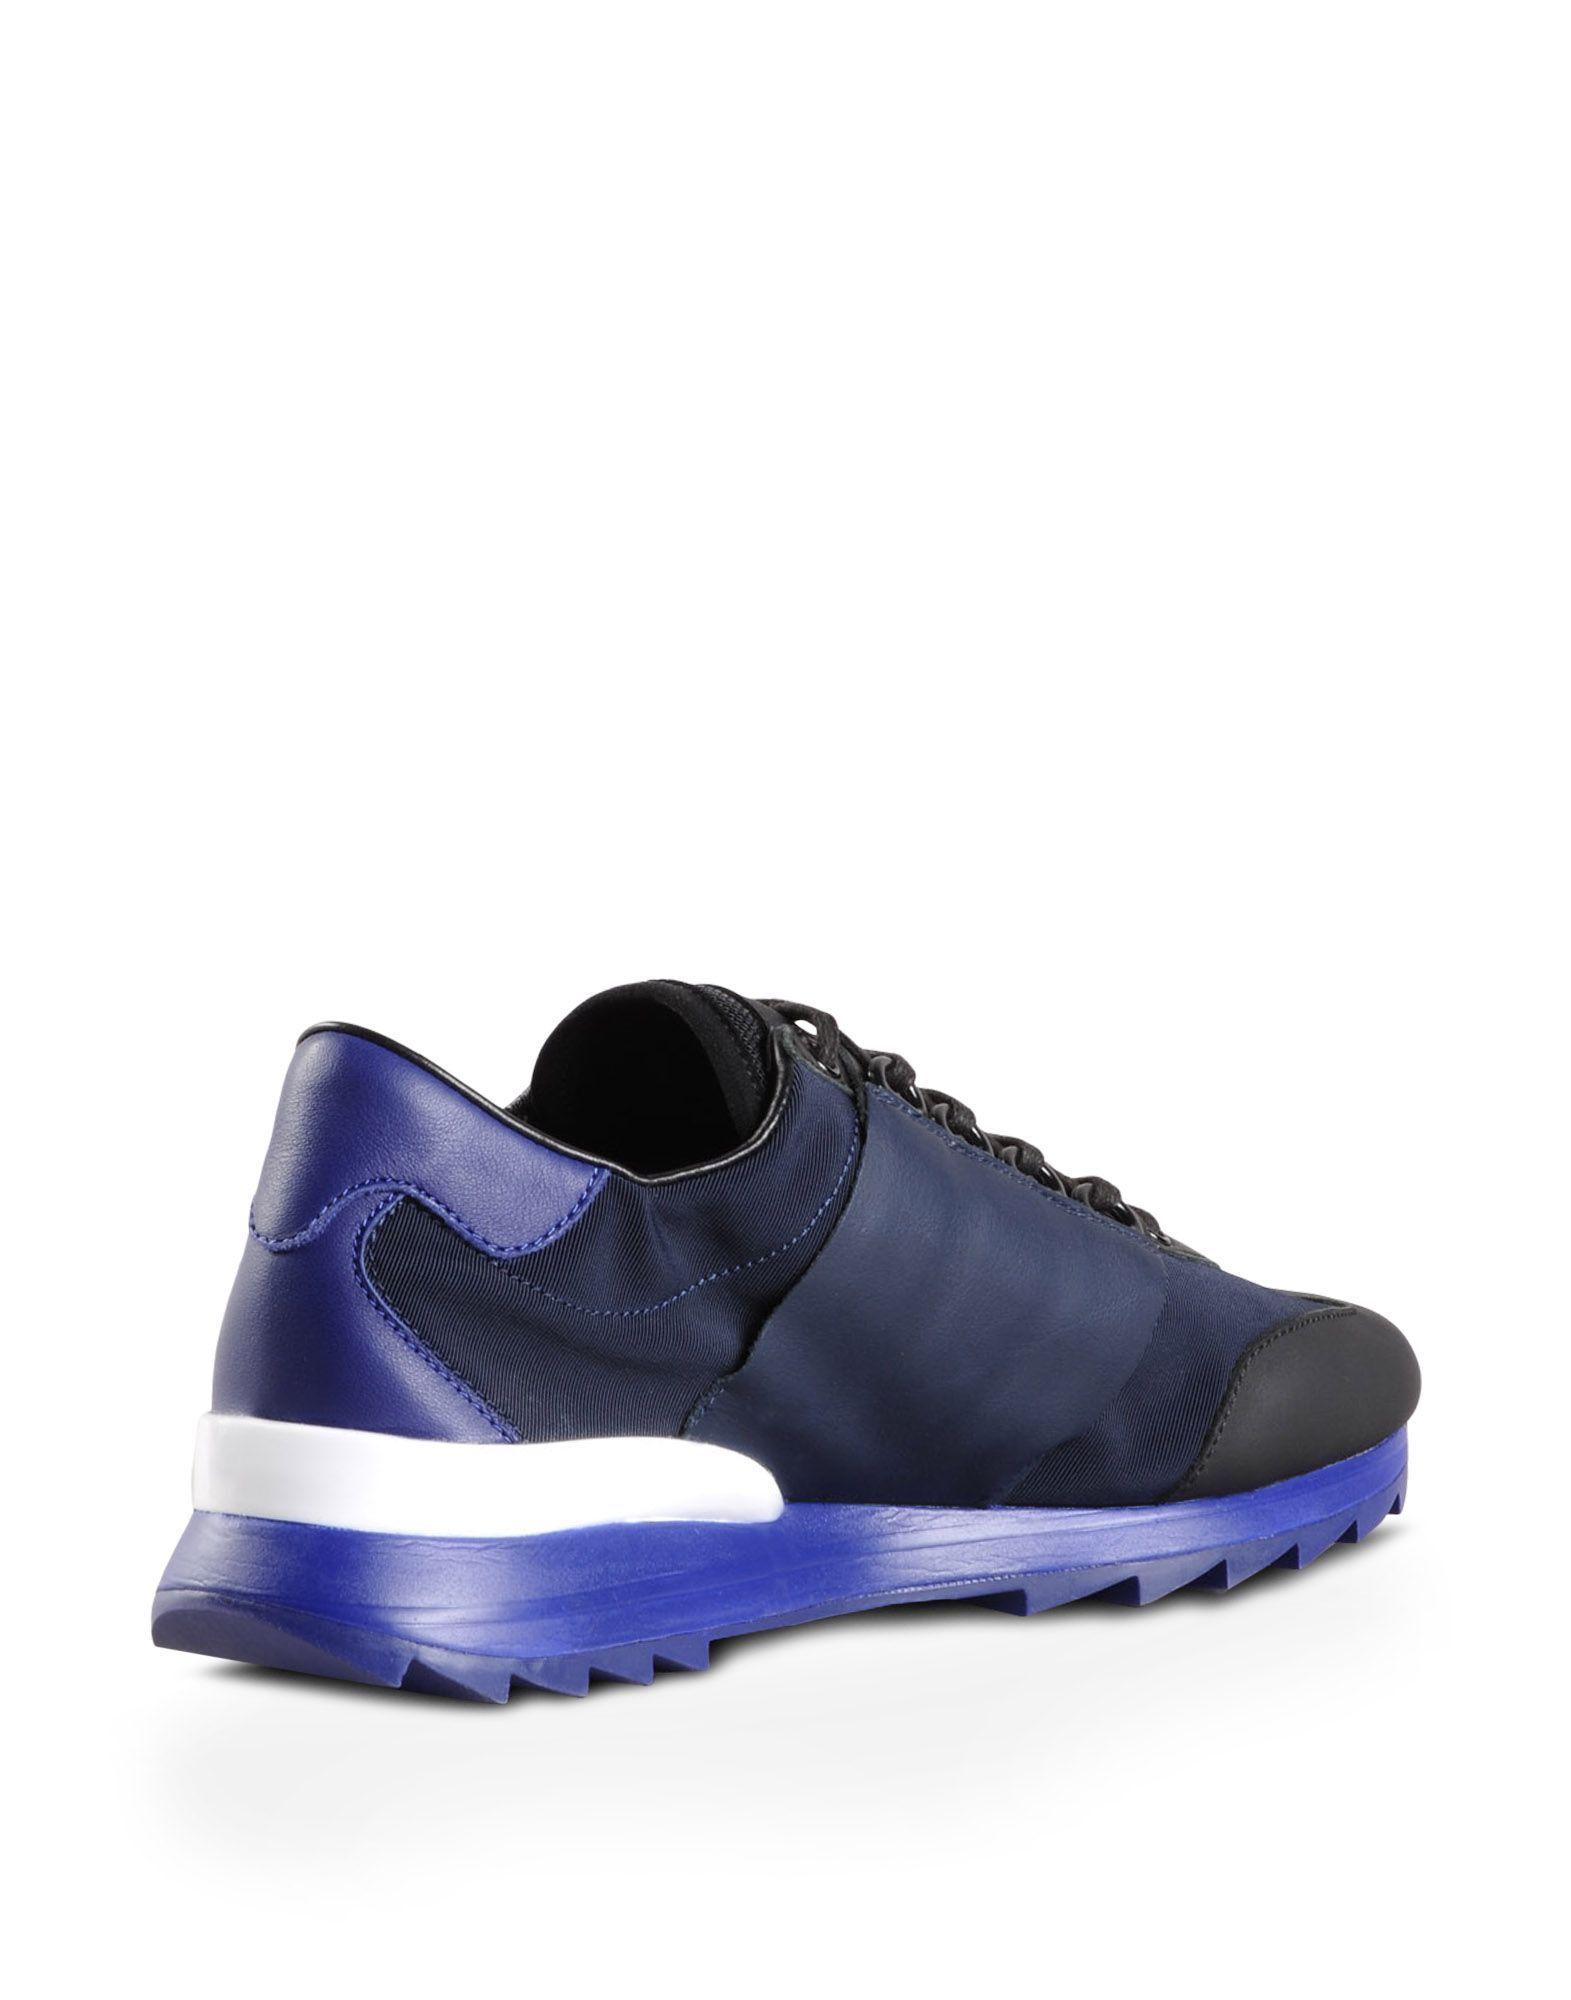 Diadora S8000 Italia shoes mens new Made in Italy sneakers Grey Rock